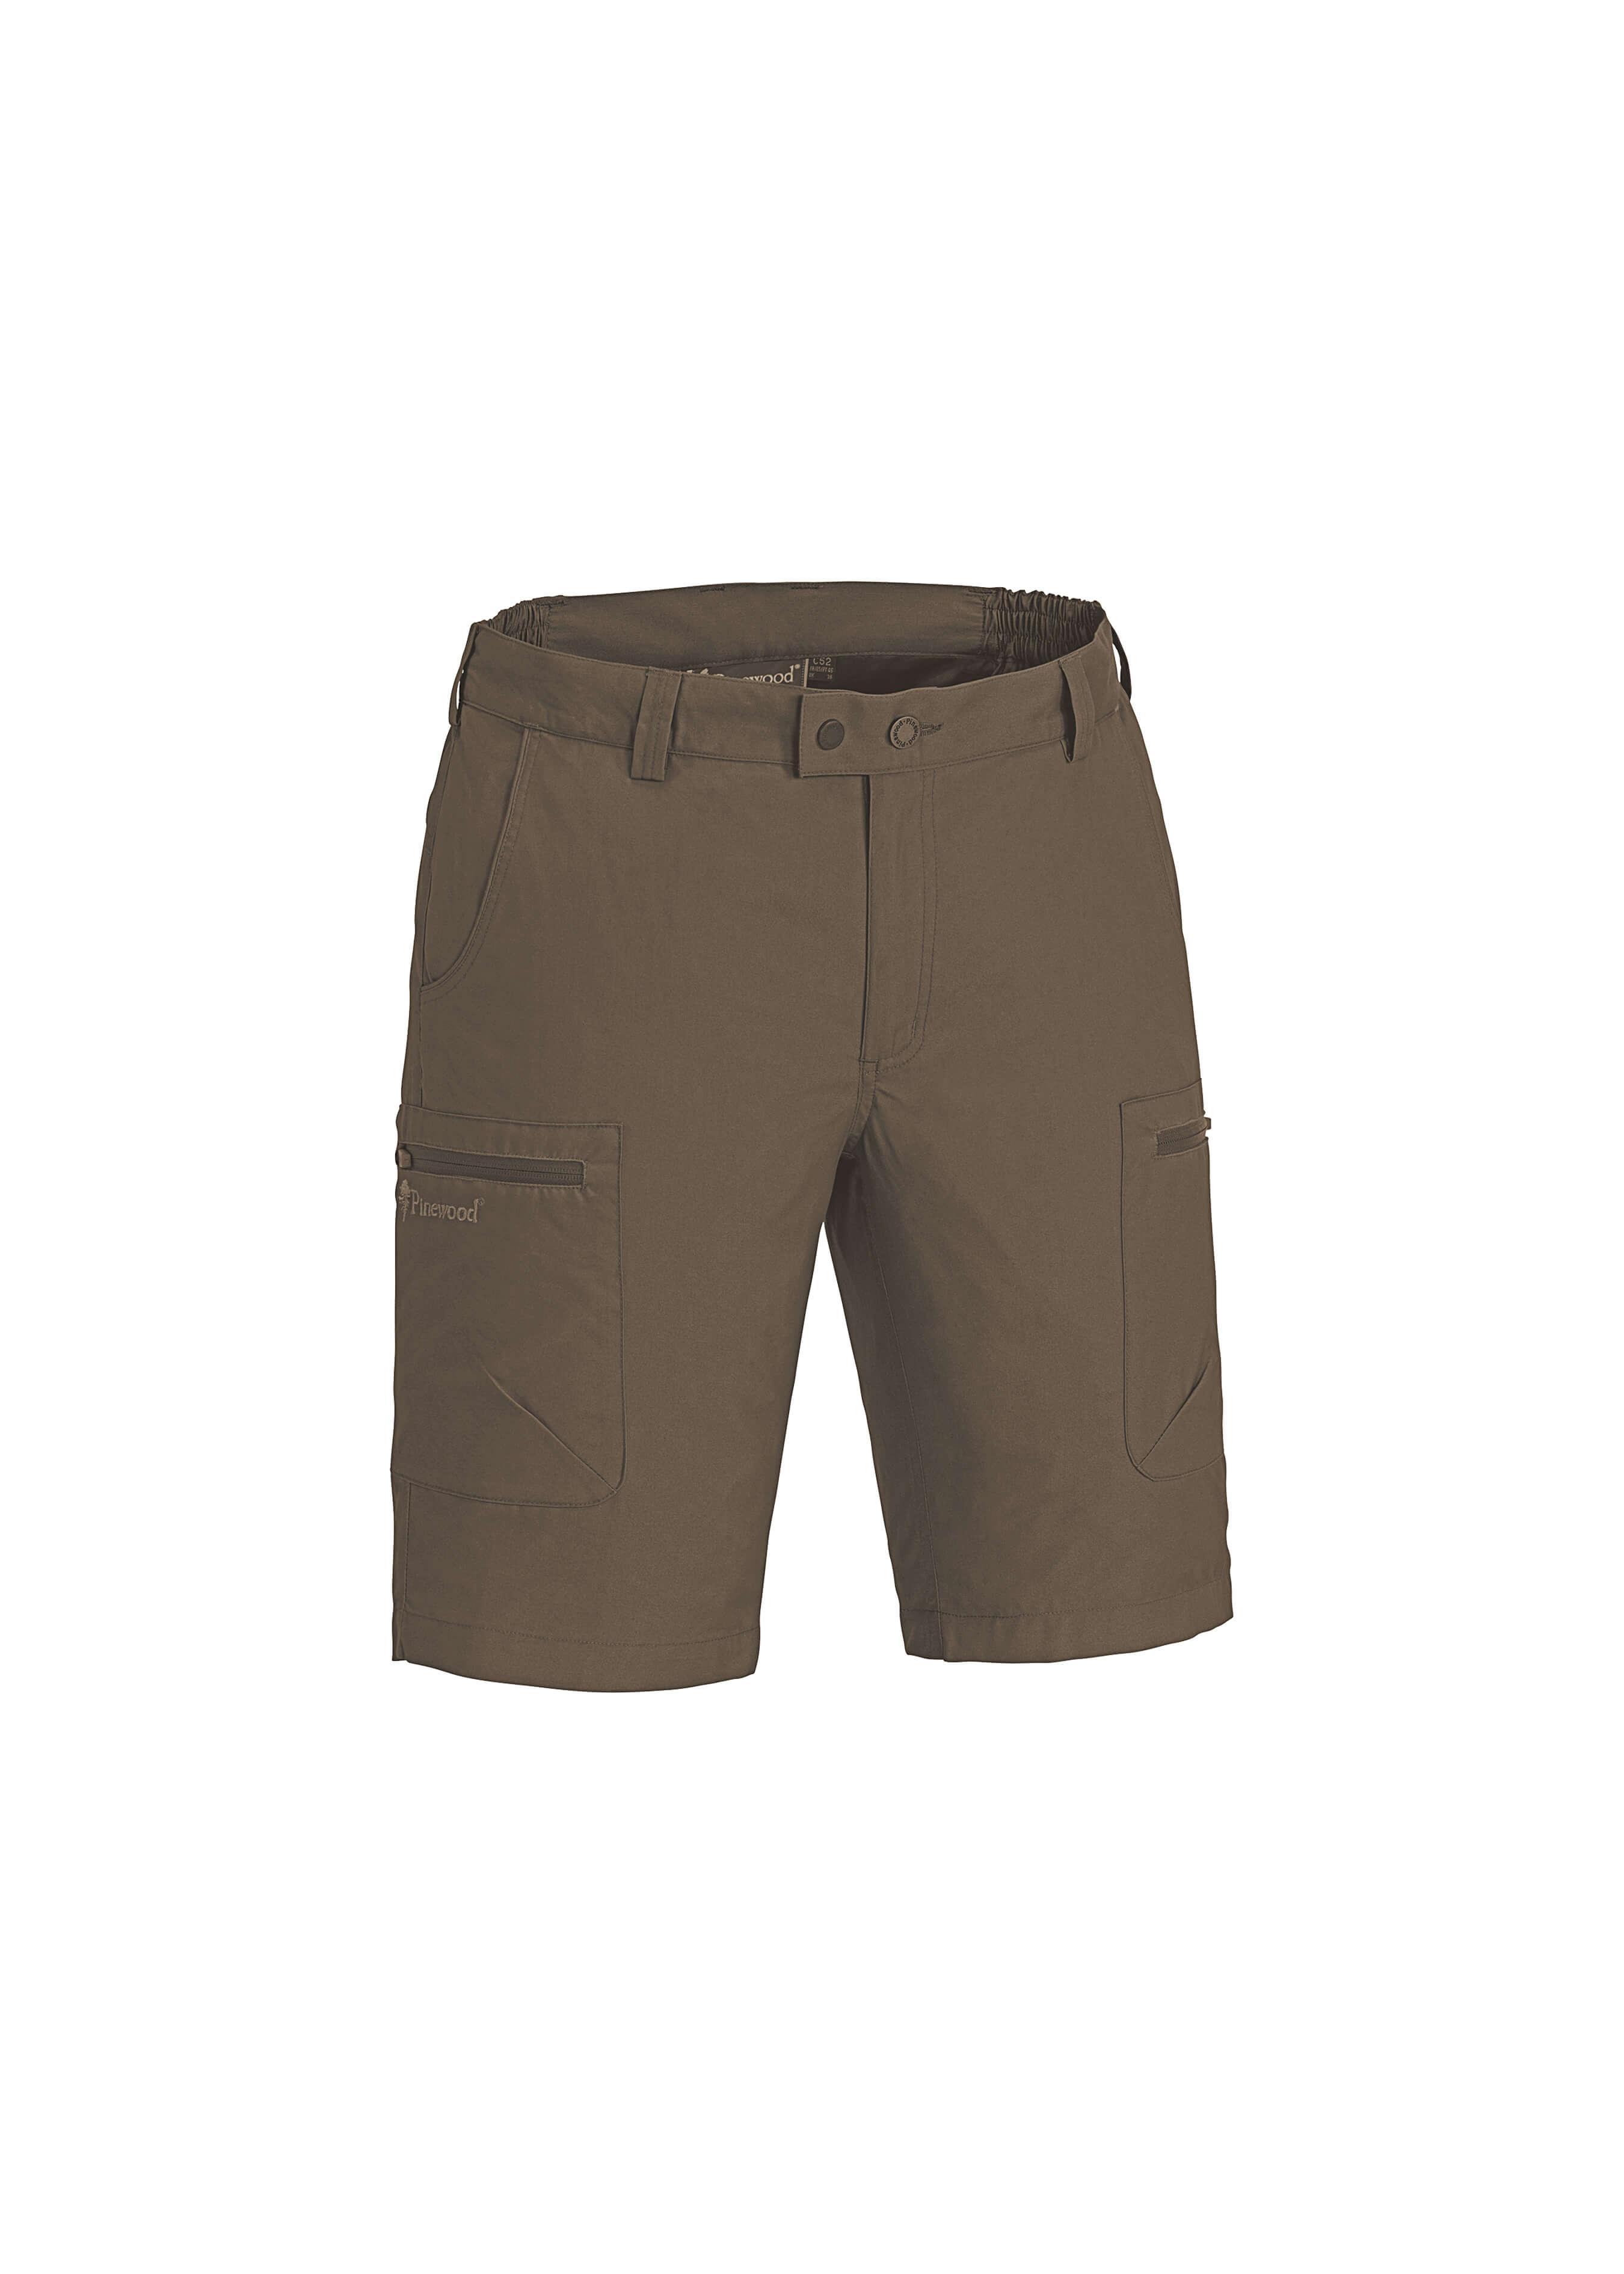 Pinewood Stretch-Short Tiveden 26852440 1